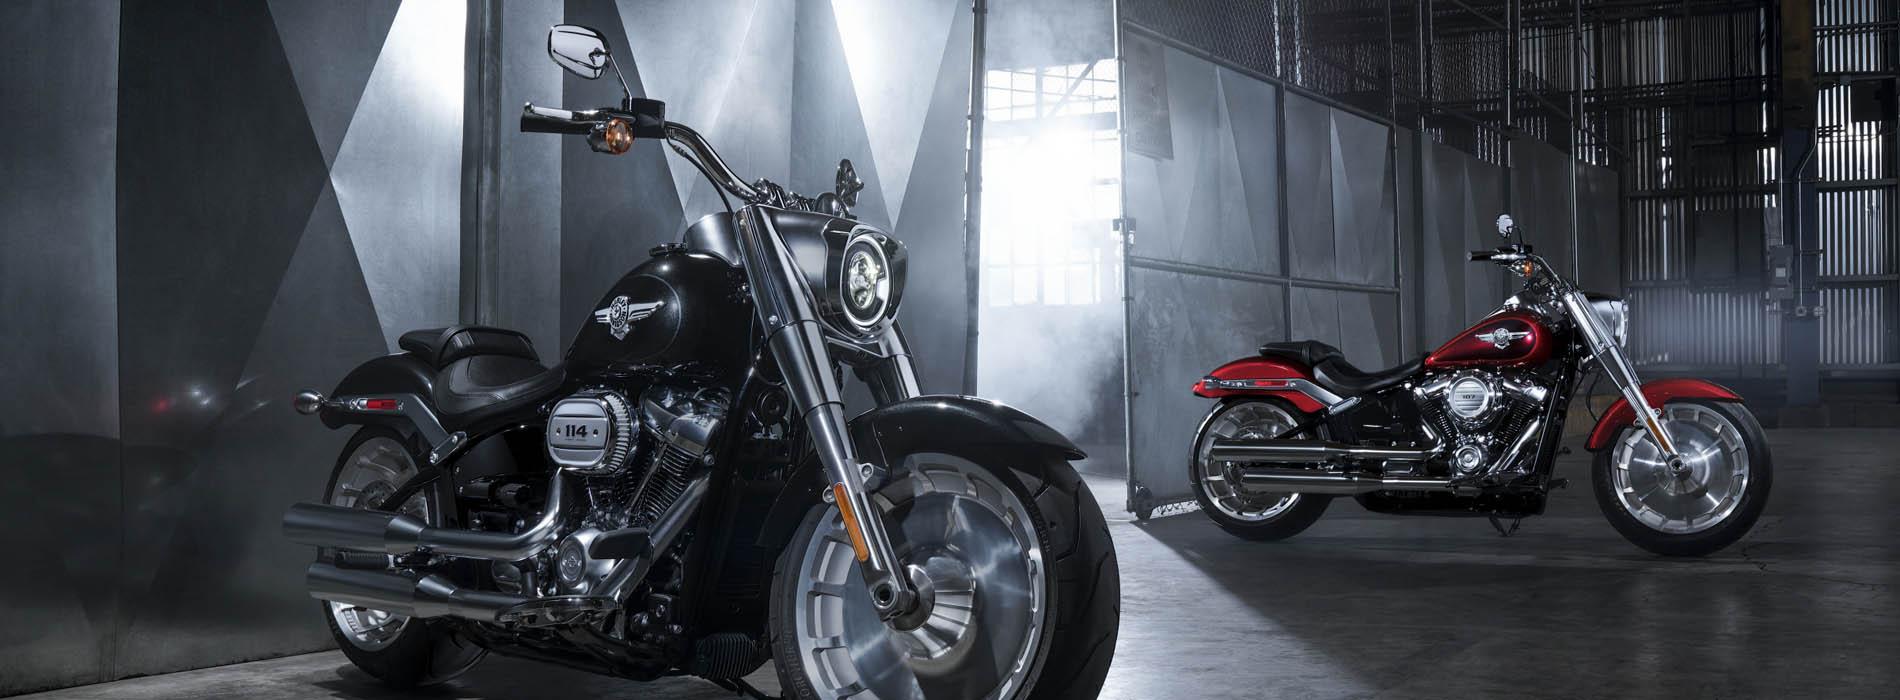 107 fat boy softail motocykle harley davidson bratislava. Black Bedroom Furniture Sets. Home Design Ideas